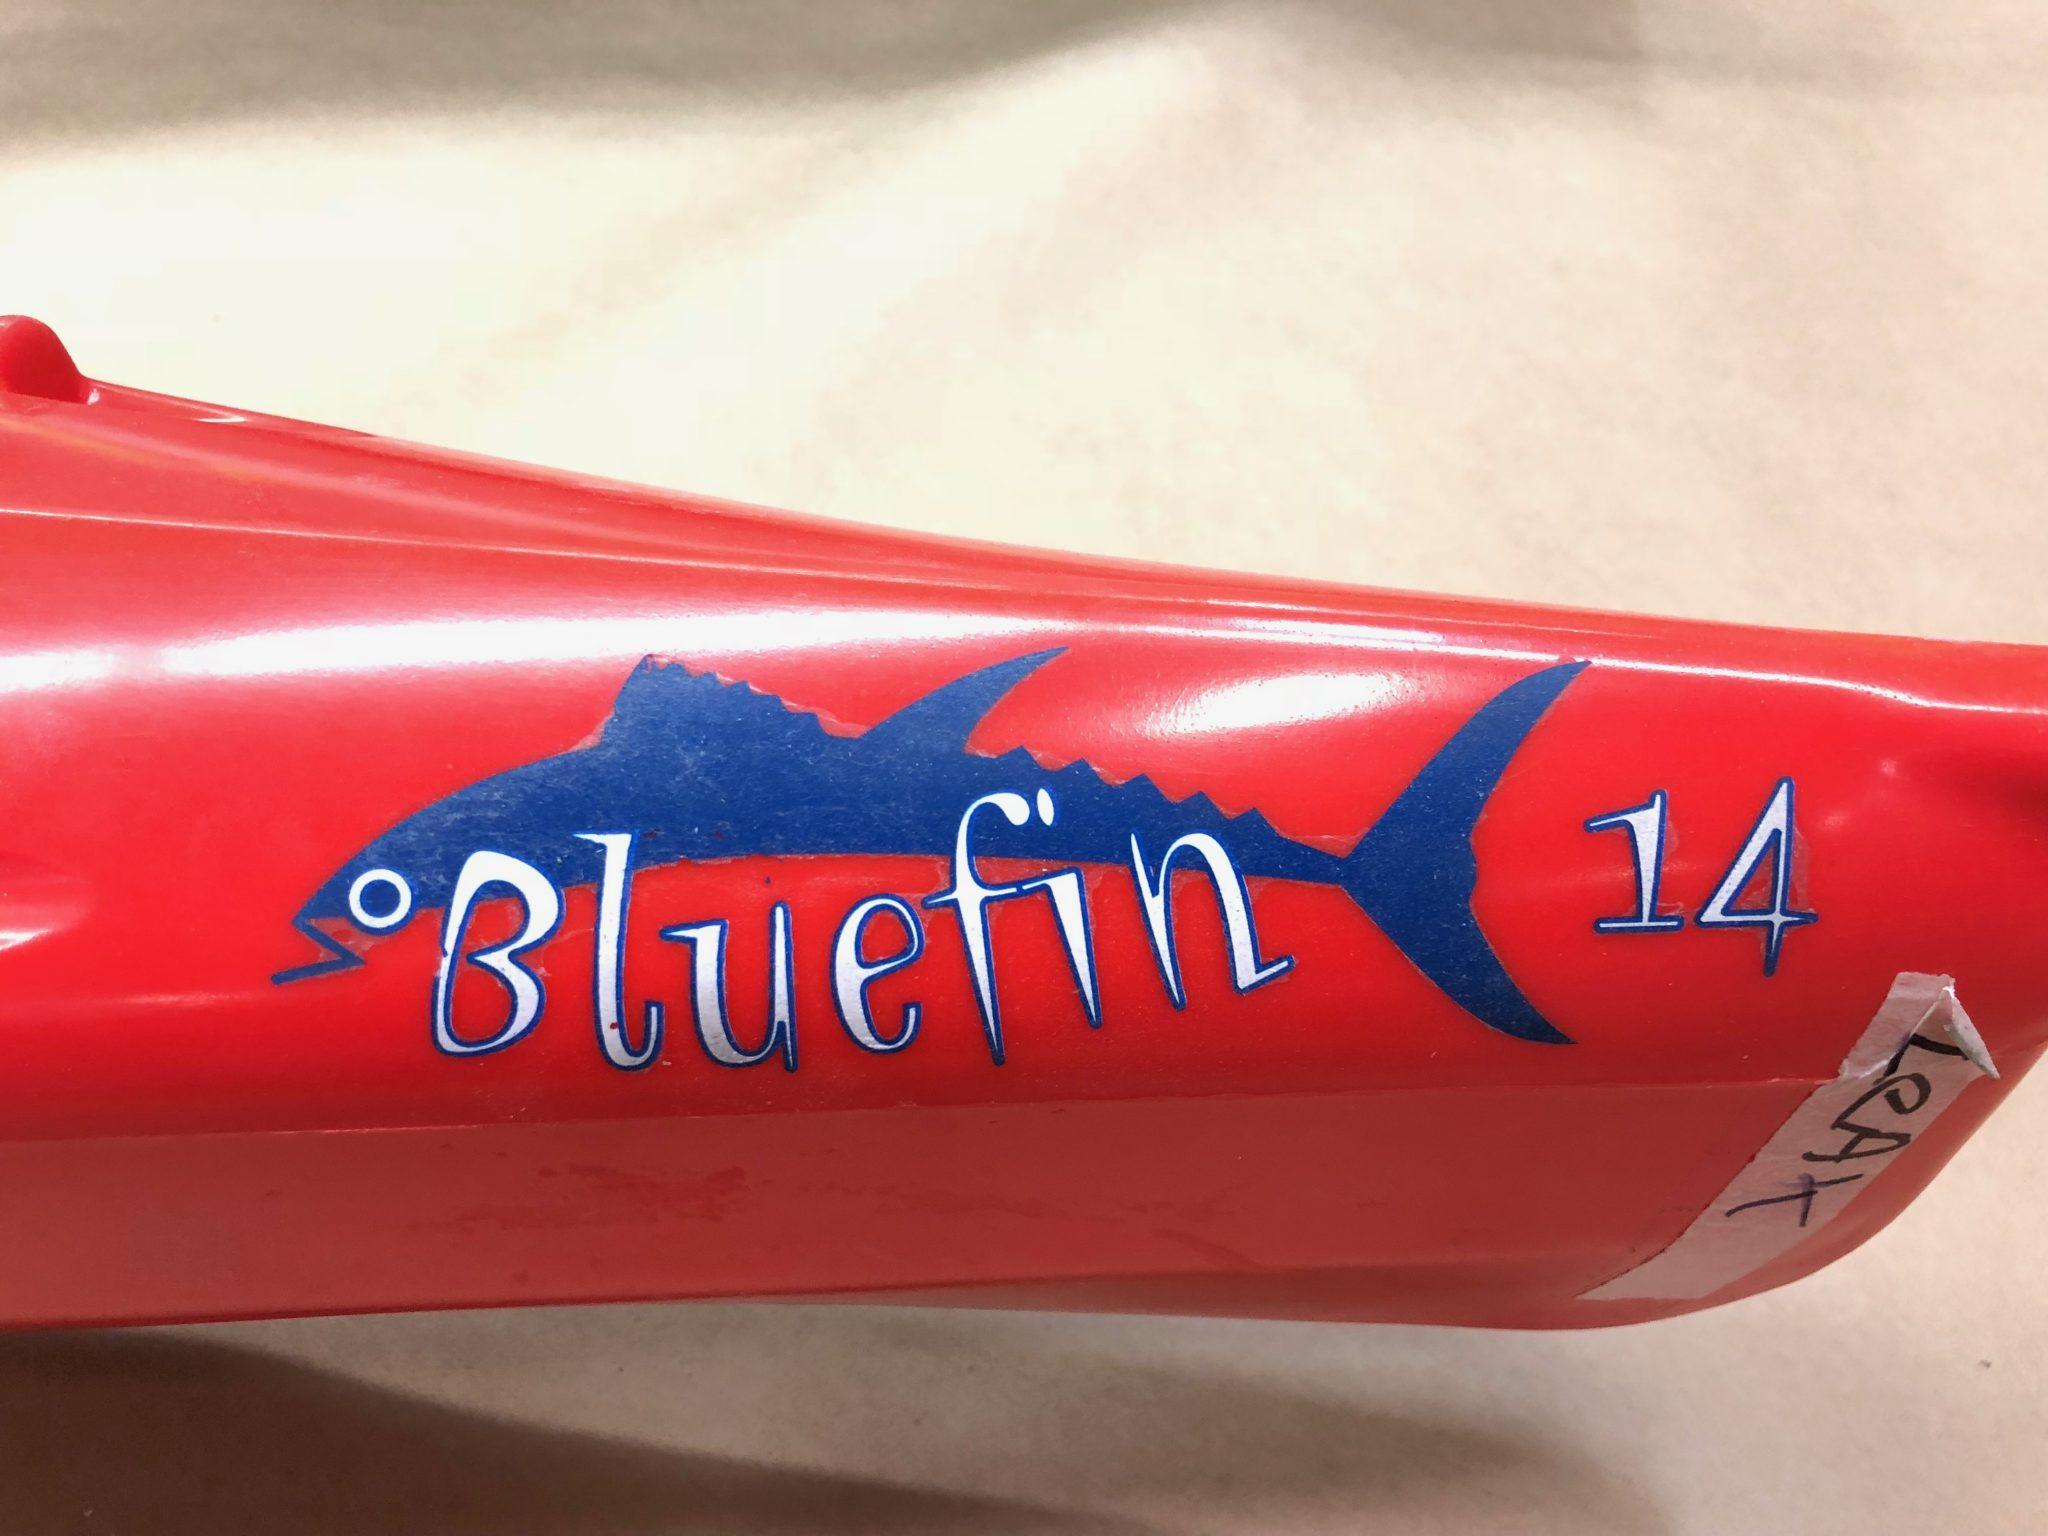 bluefin on chili